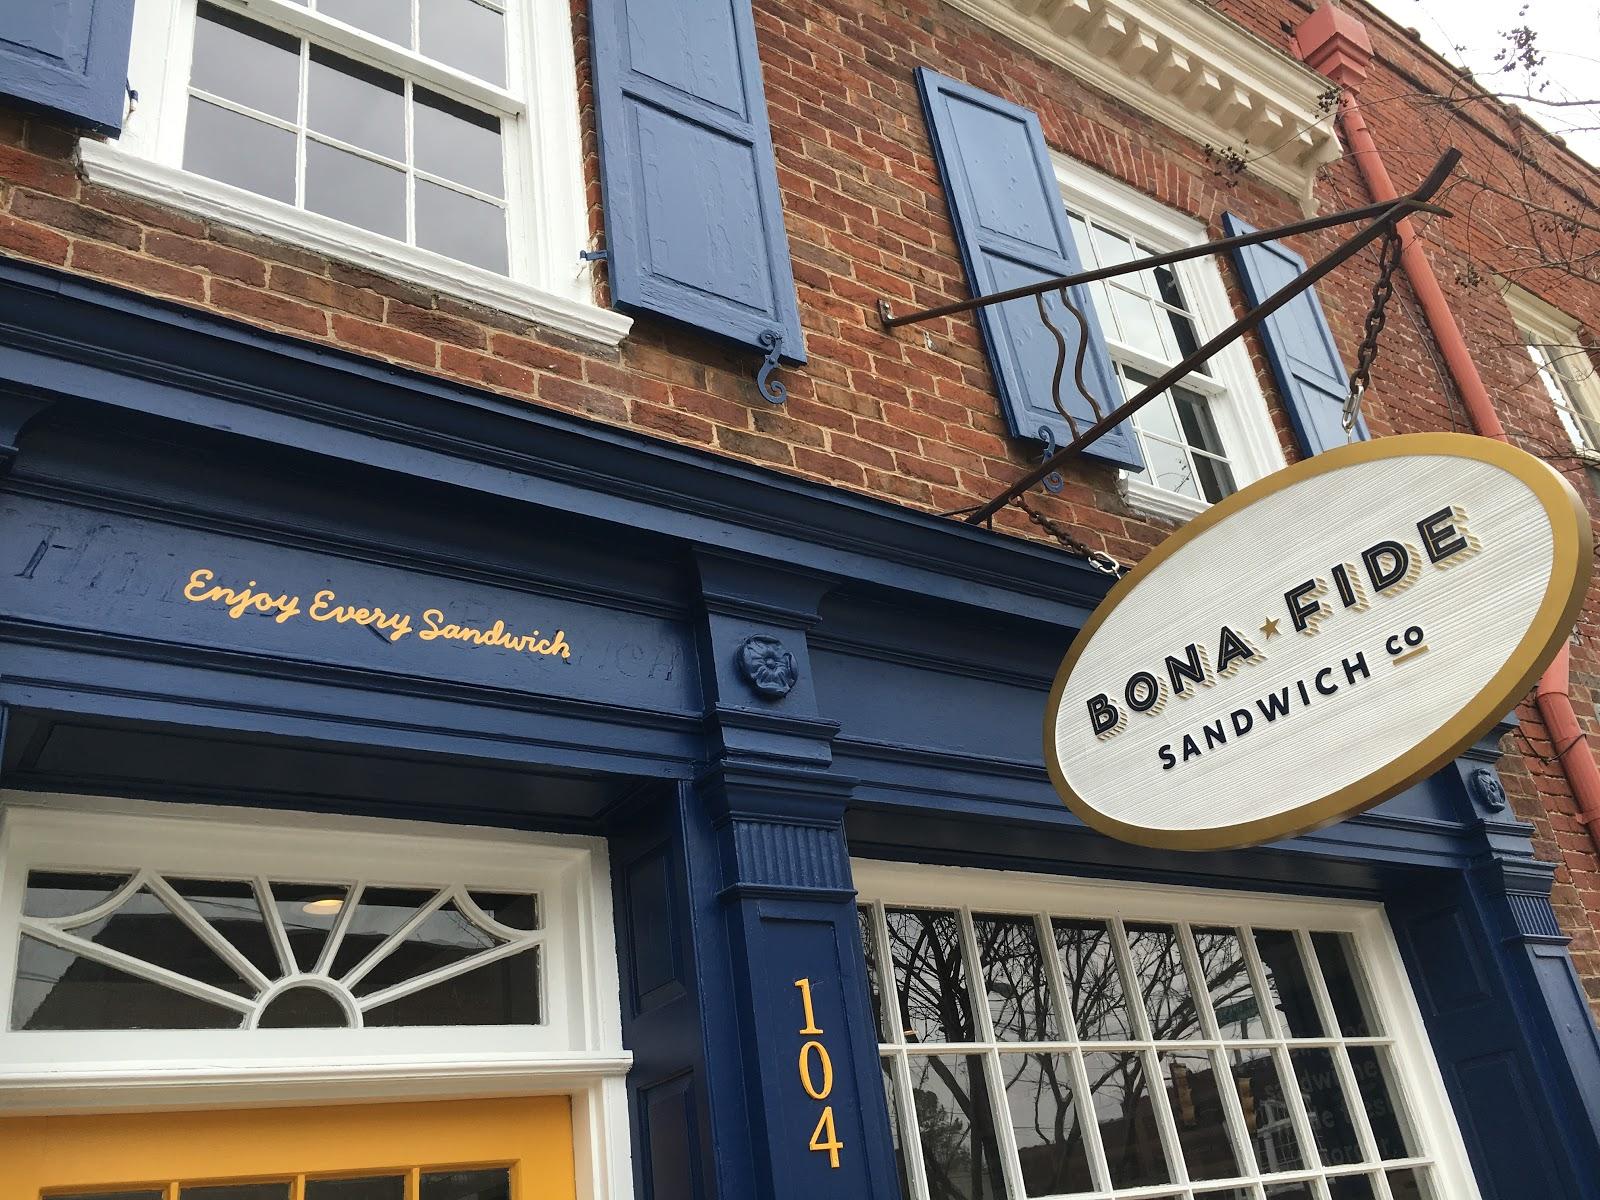 Katharines Travel Blog Bonafide Sandwich Shop In Hillsborough Nc